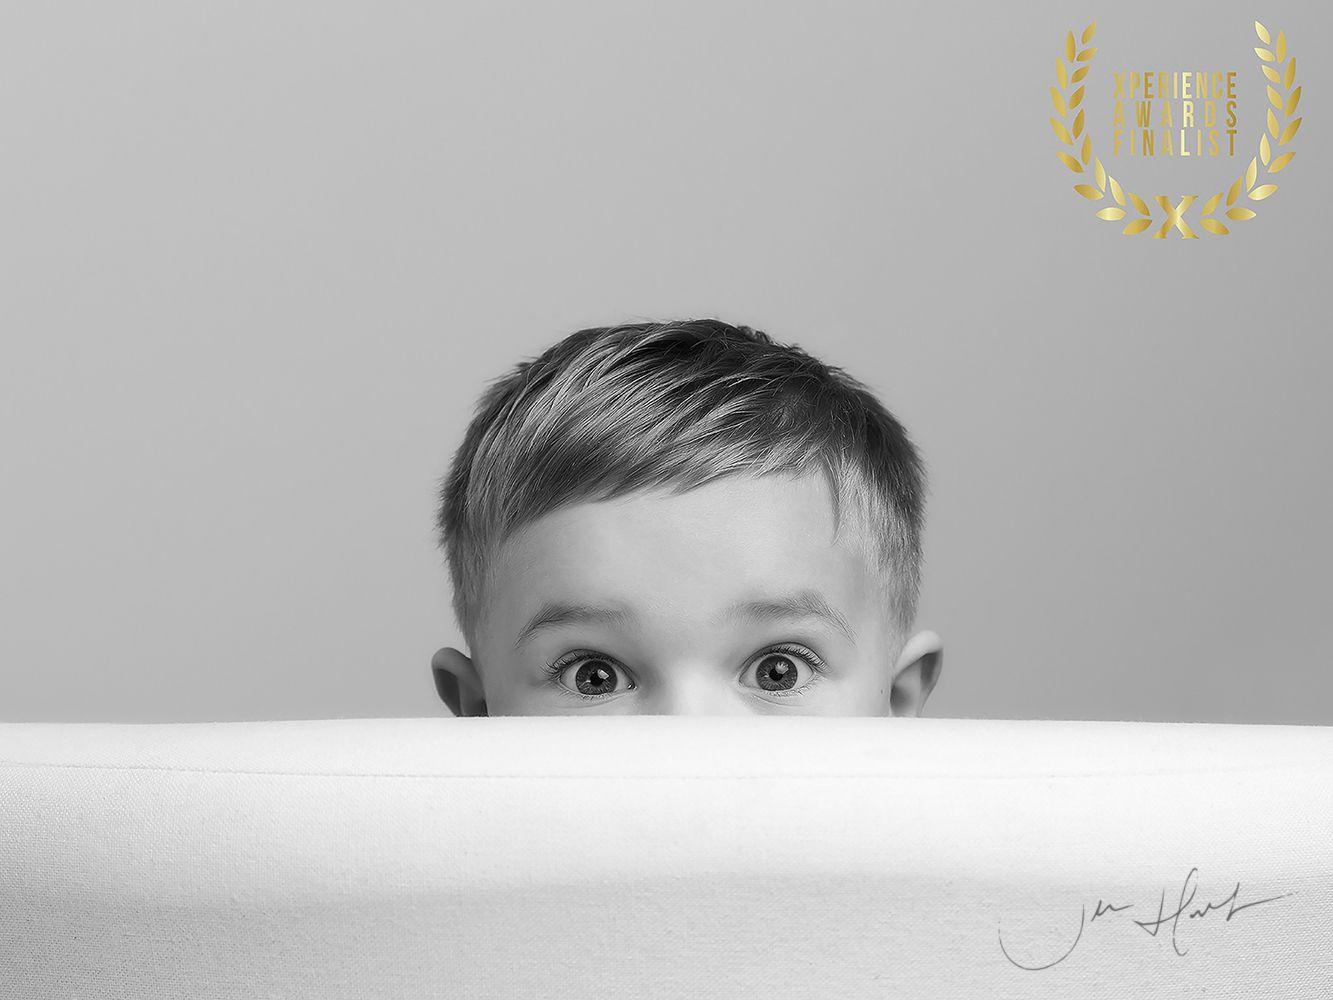 Baby-Child-Photography-Studio-Portrait-Jen-Hart-Bobby